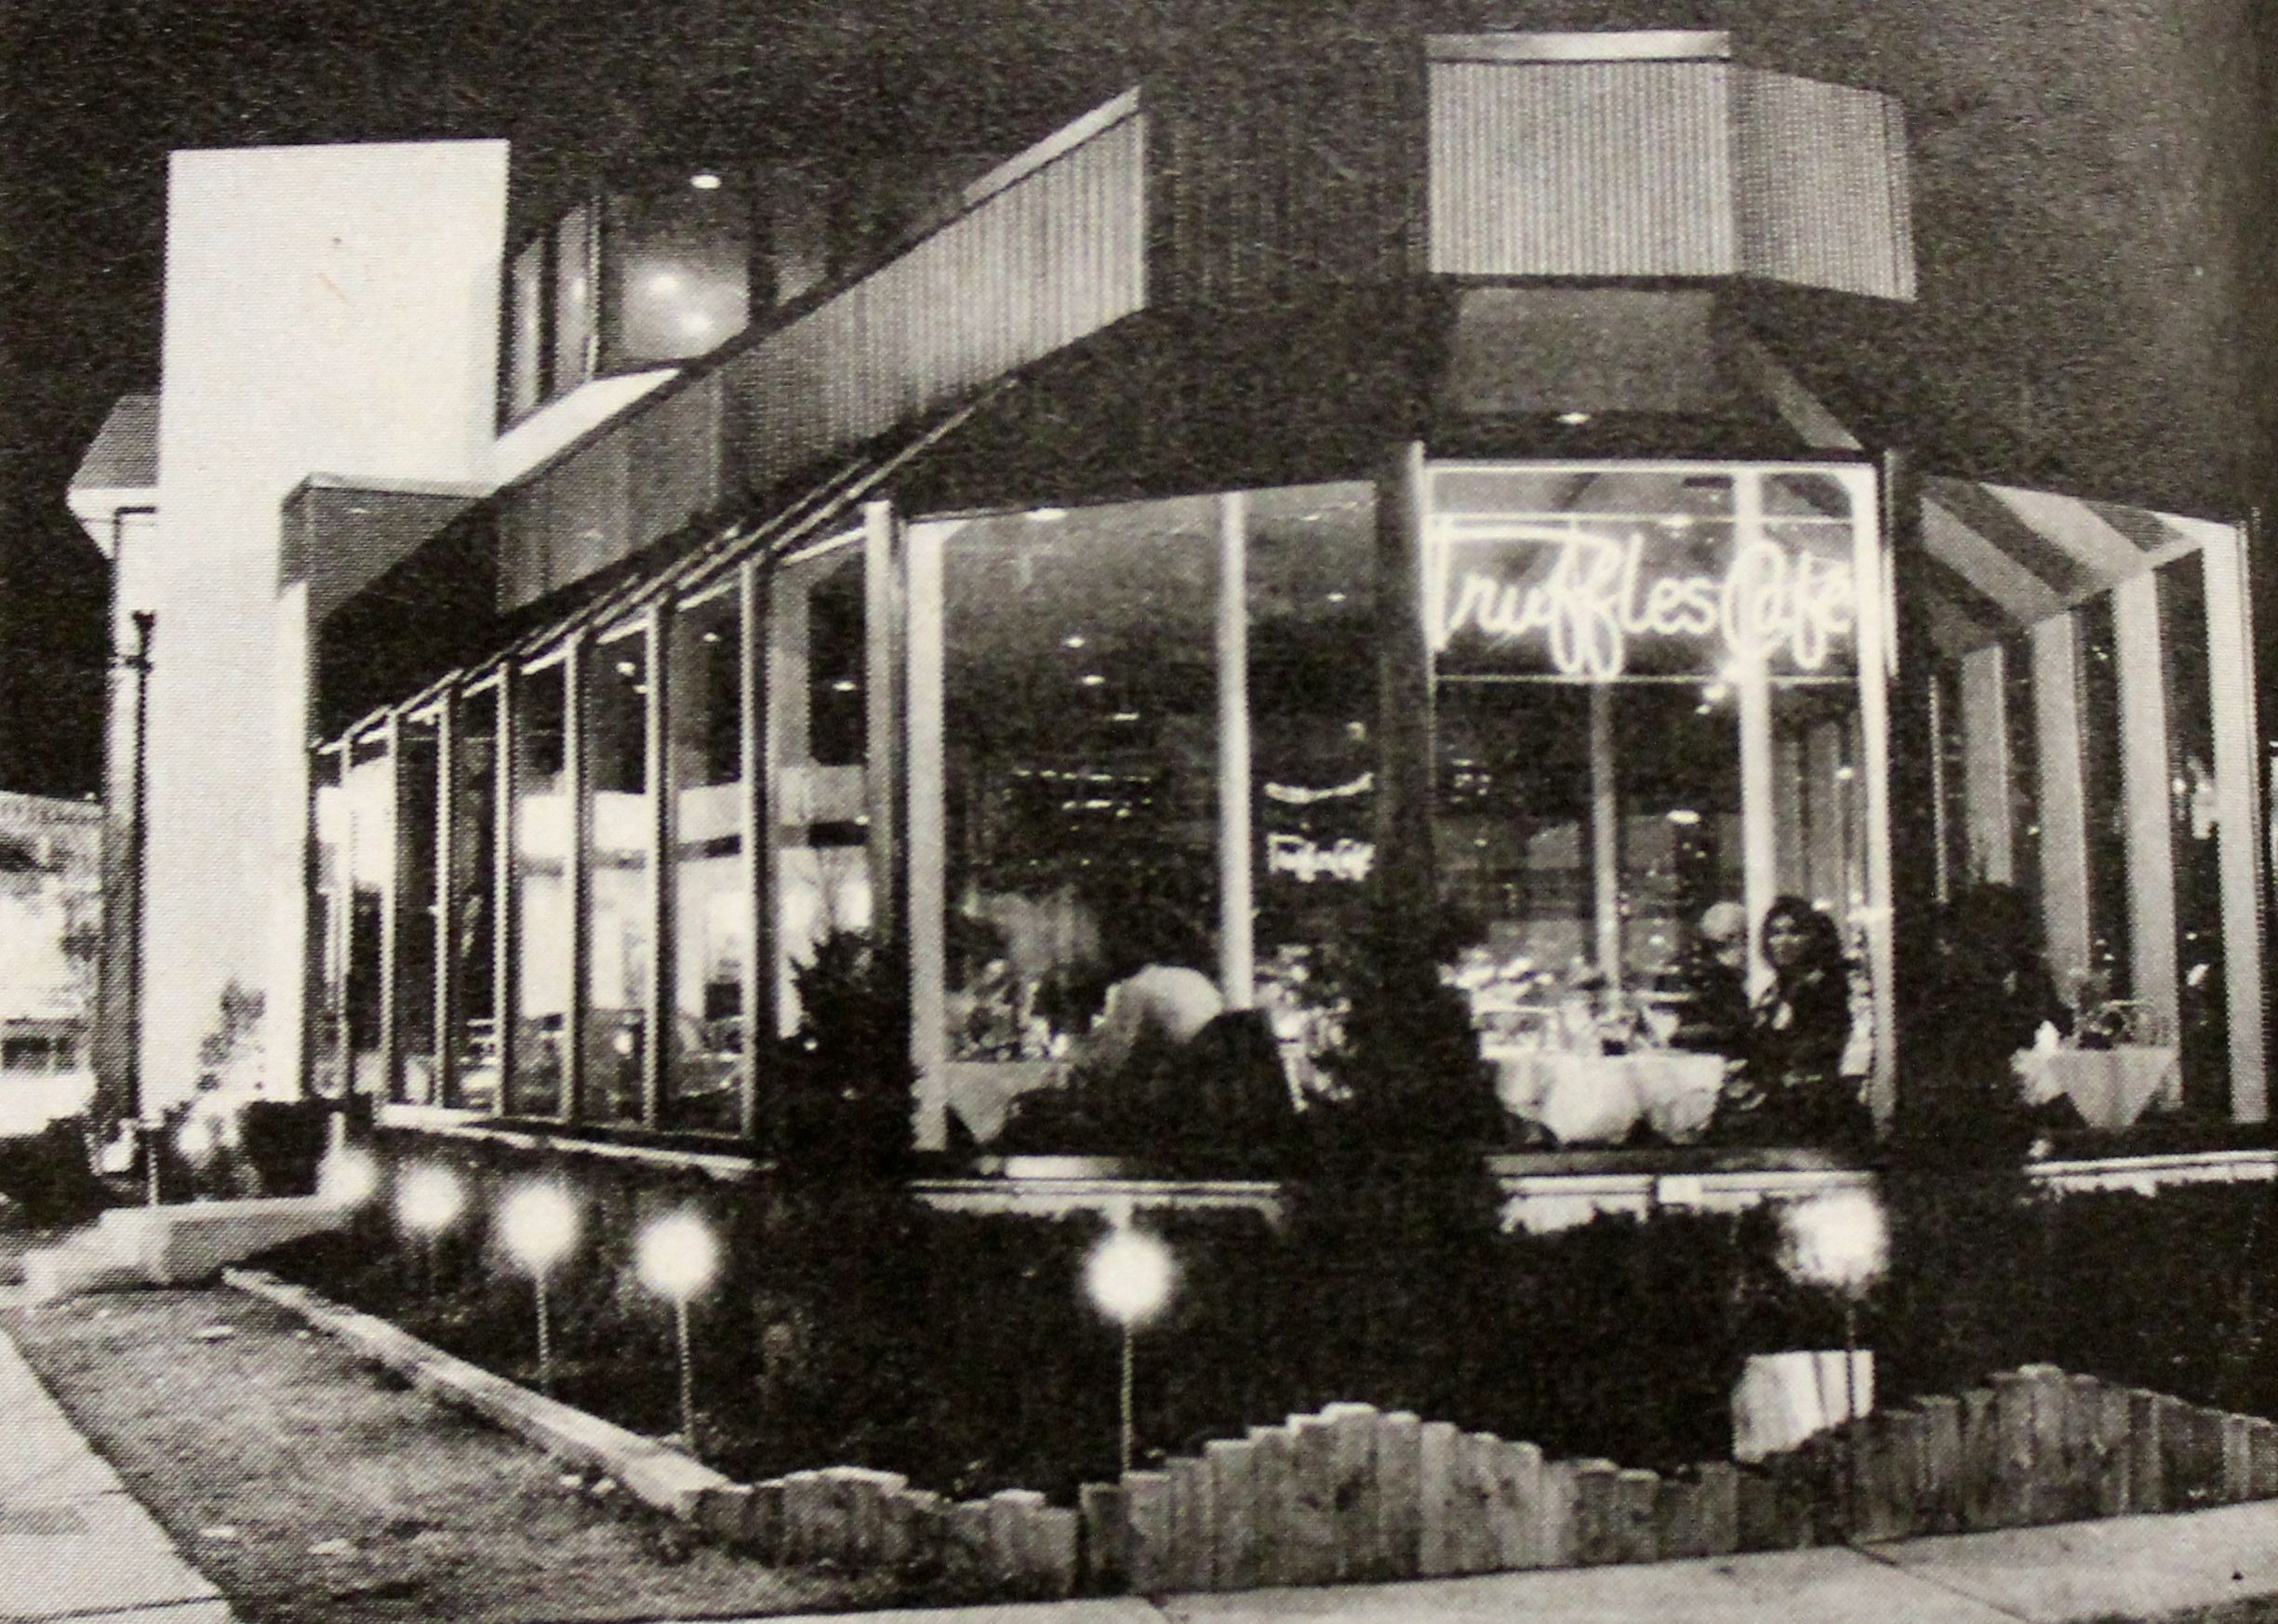 Truffles Cafe In Fort Lee Nj 1980 S Palisades Amusement Park Cliffside Park Bergen County New Jersey